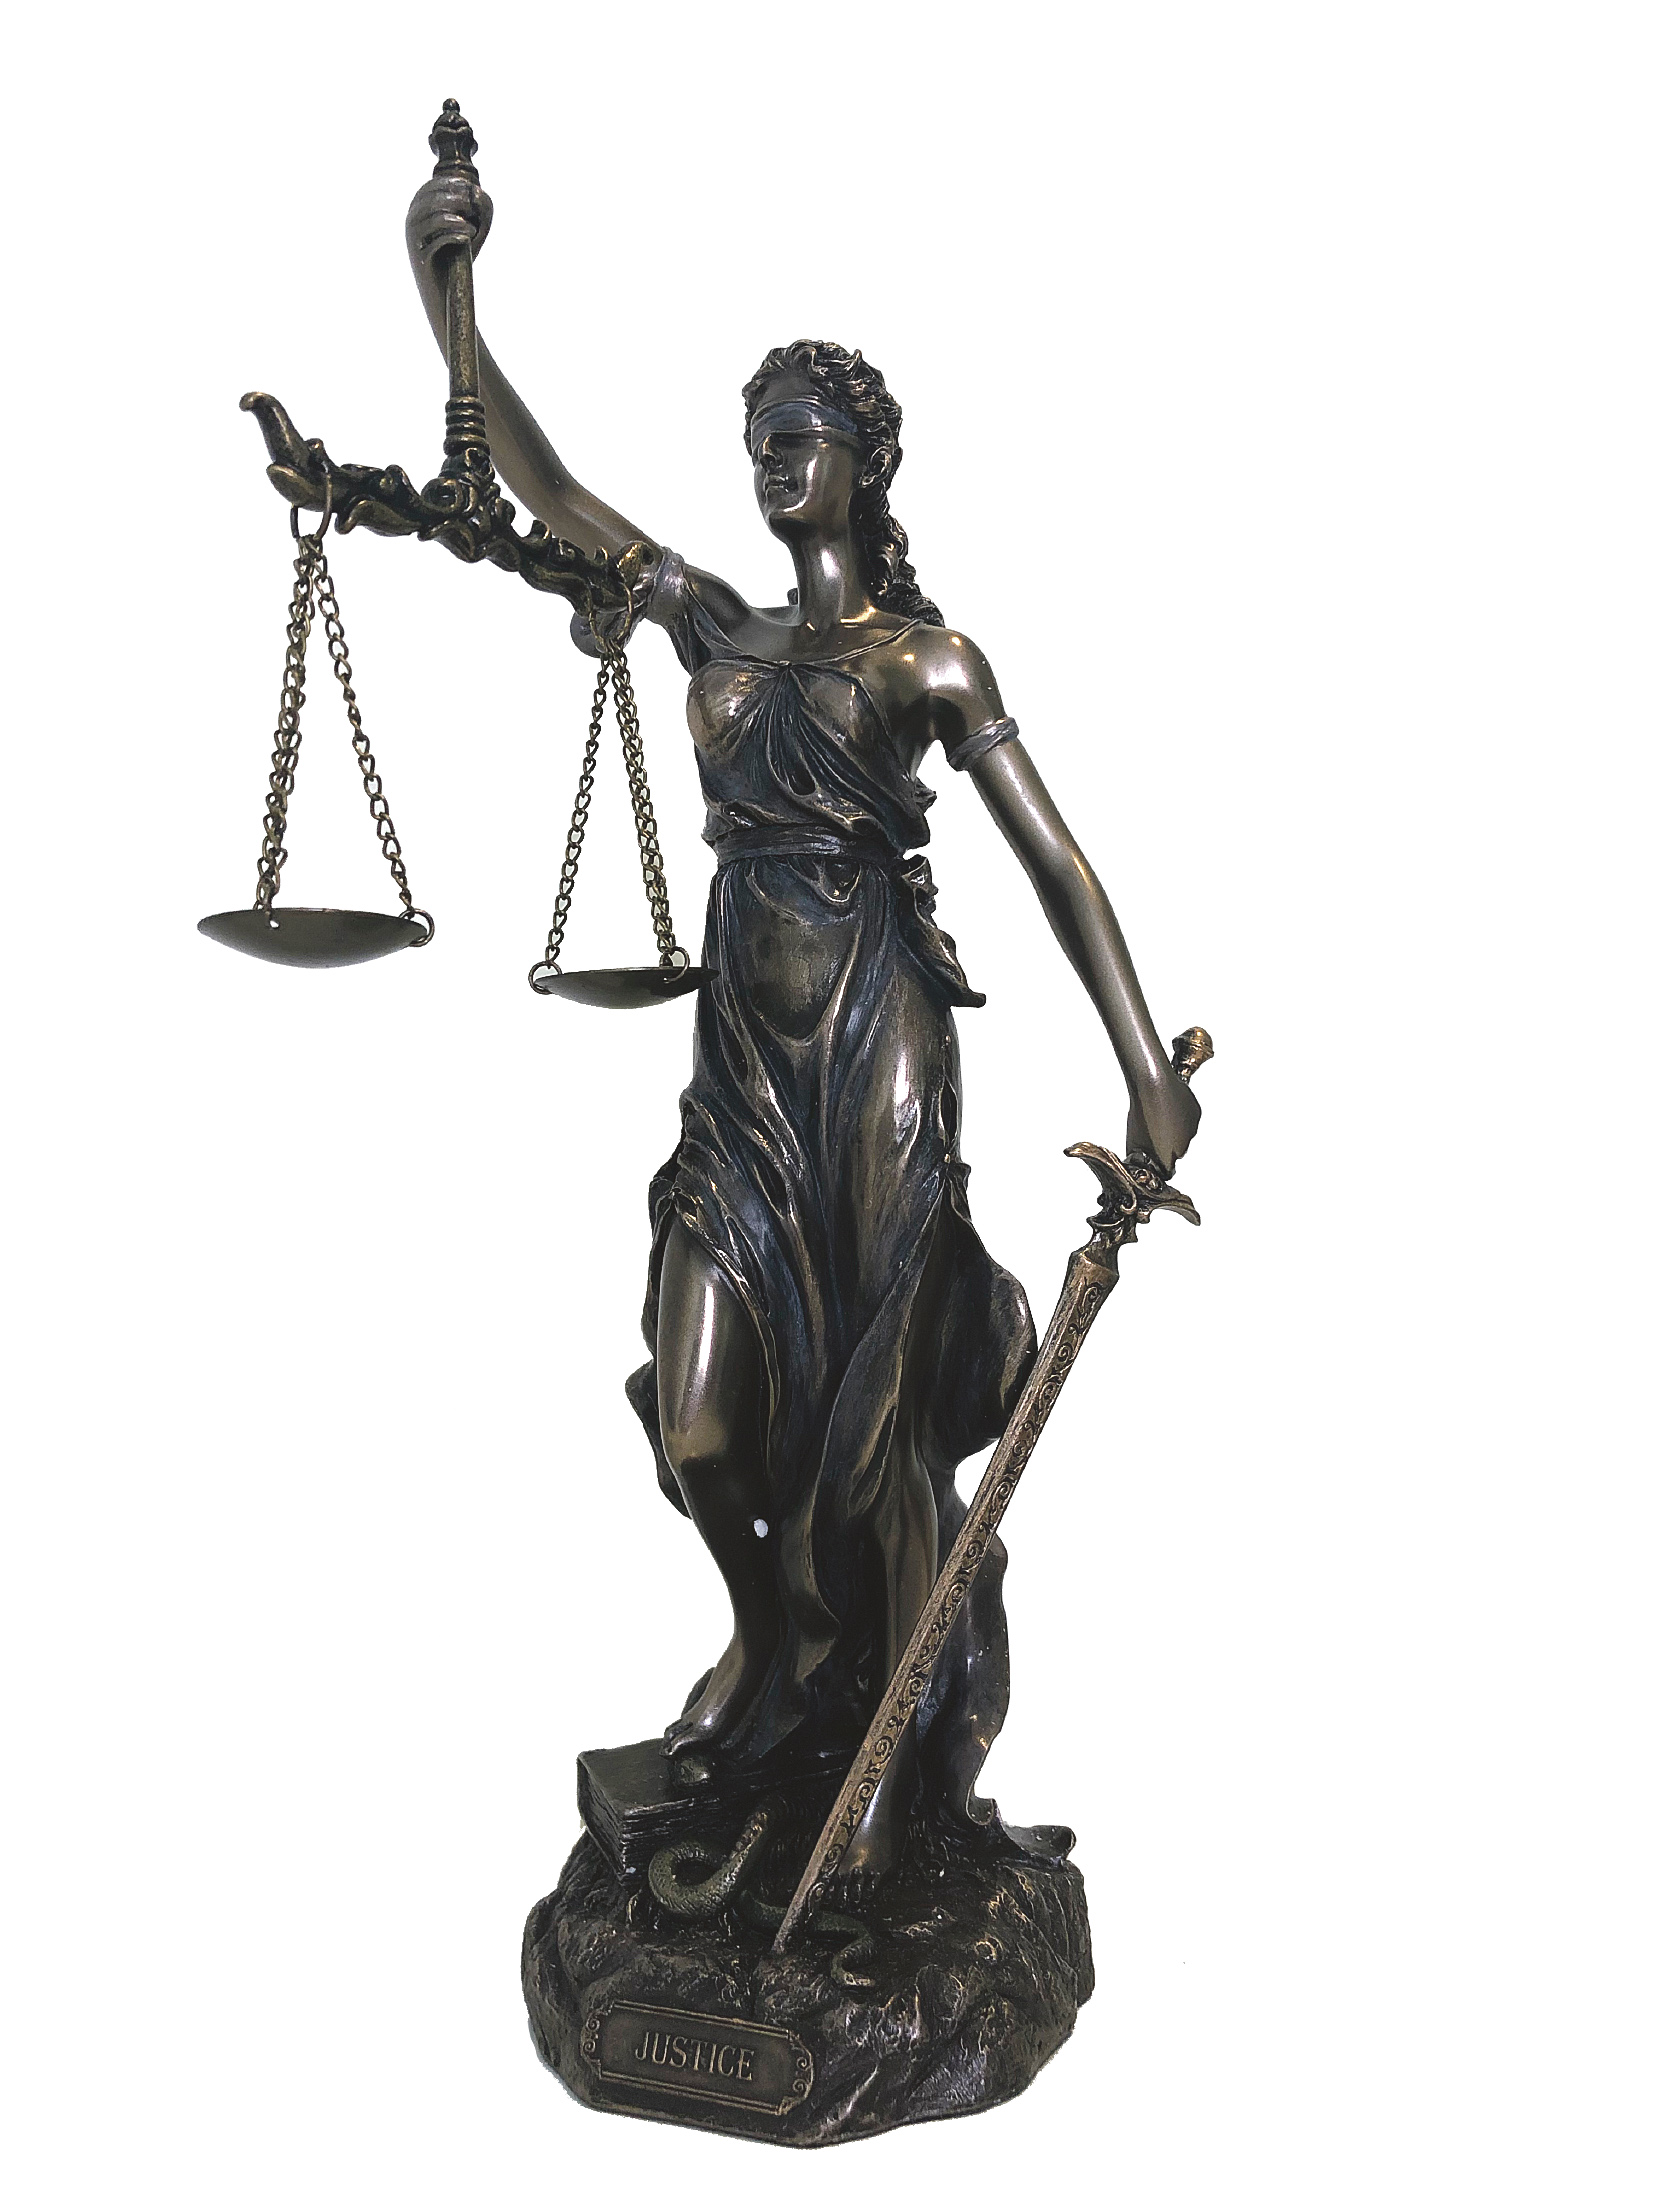 Advokaten Agneta: Om juridiska begrepp på bokstaven J